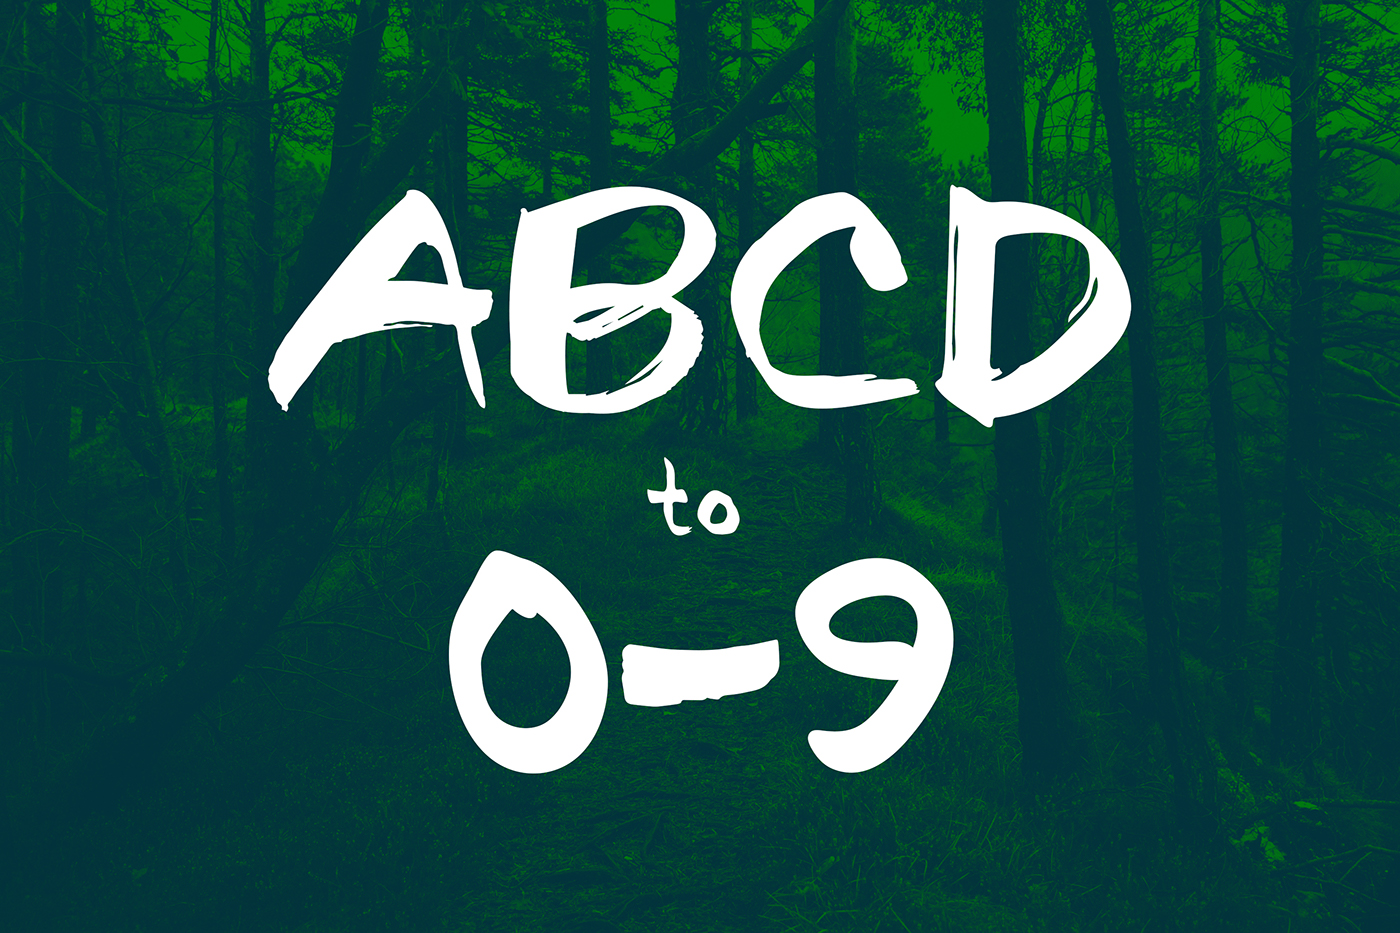 font,Free font,free,handwritten,display font,handwriting font,brushed,semi brush,brushed font,free type